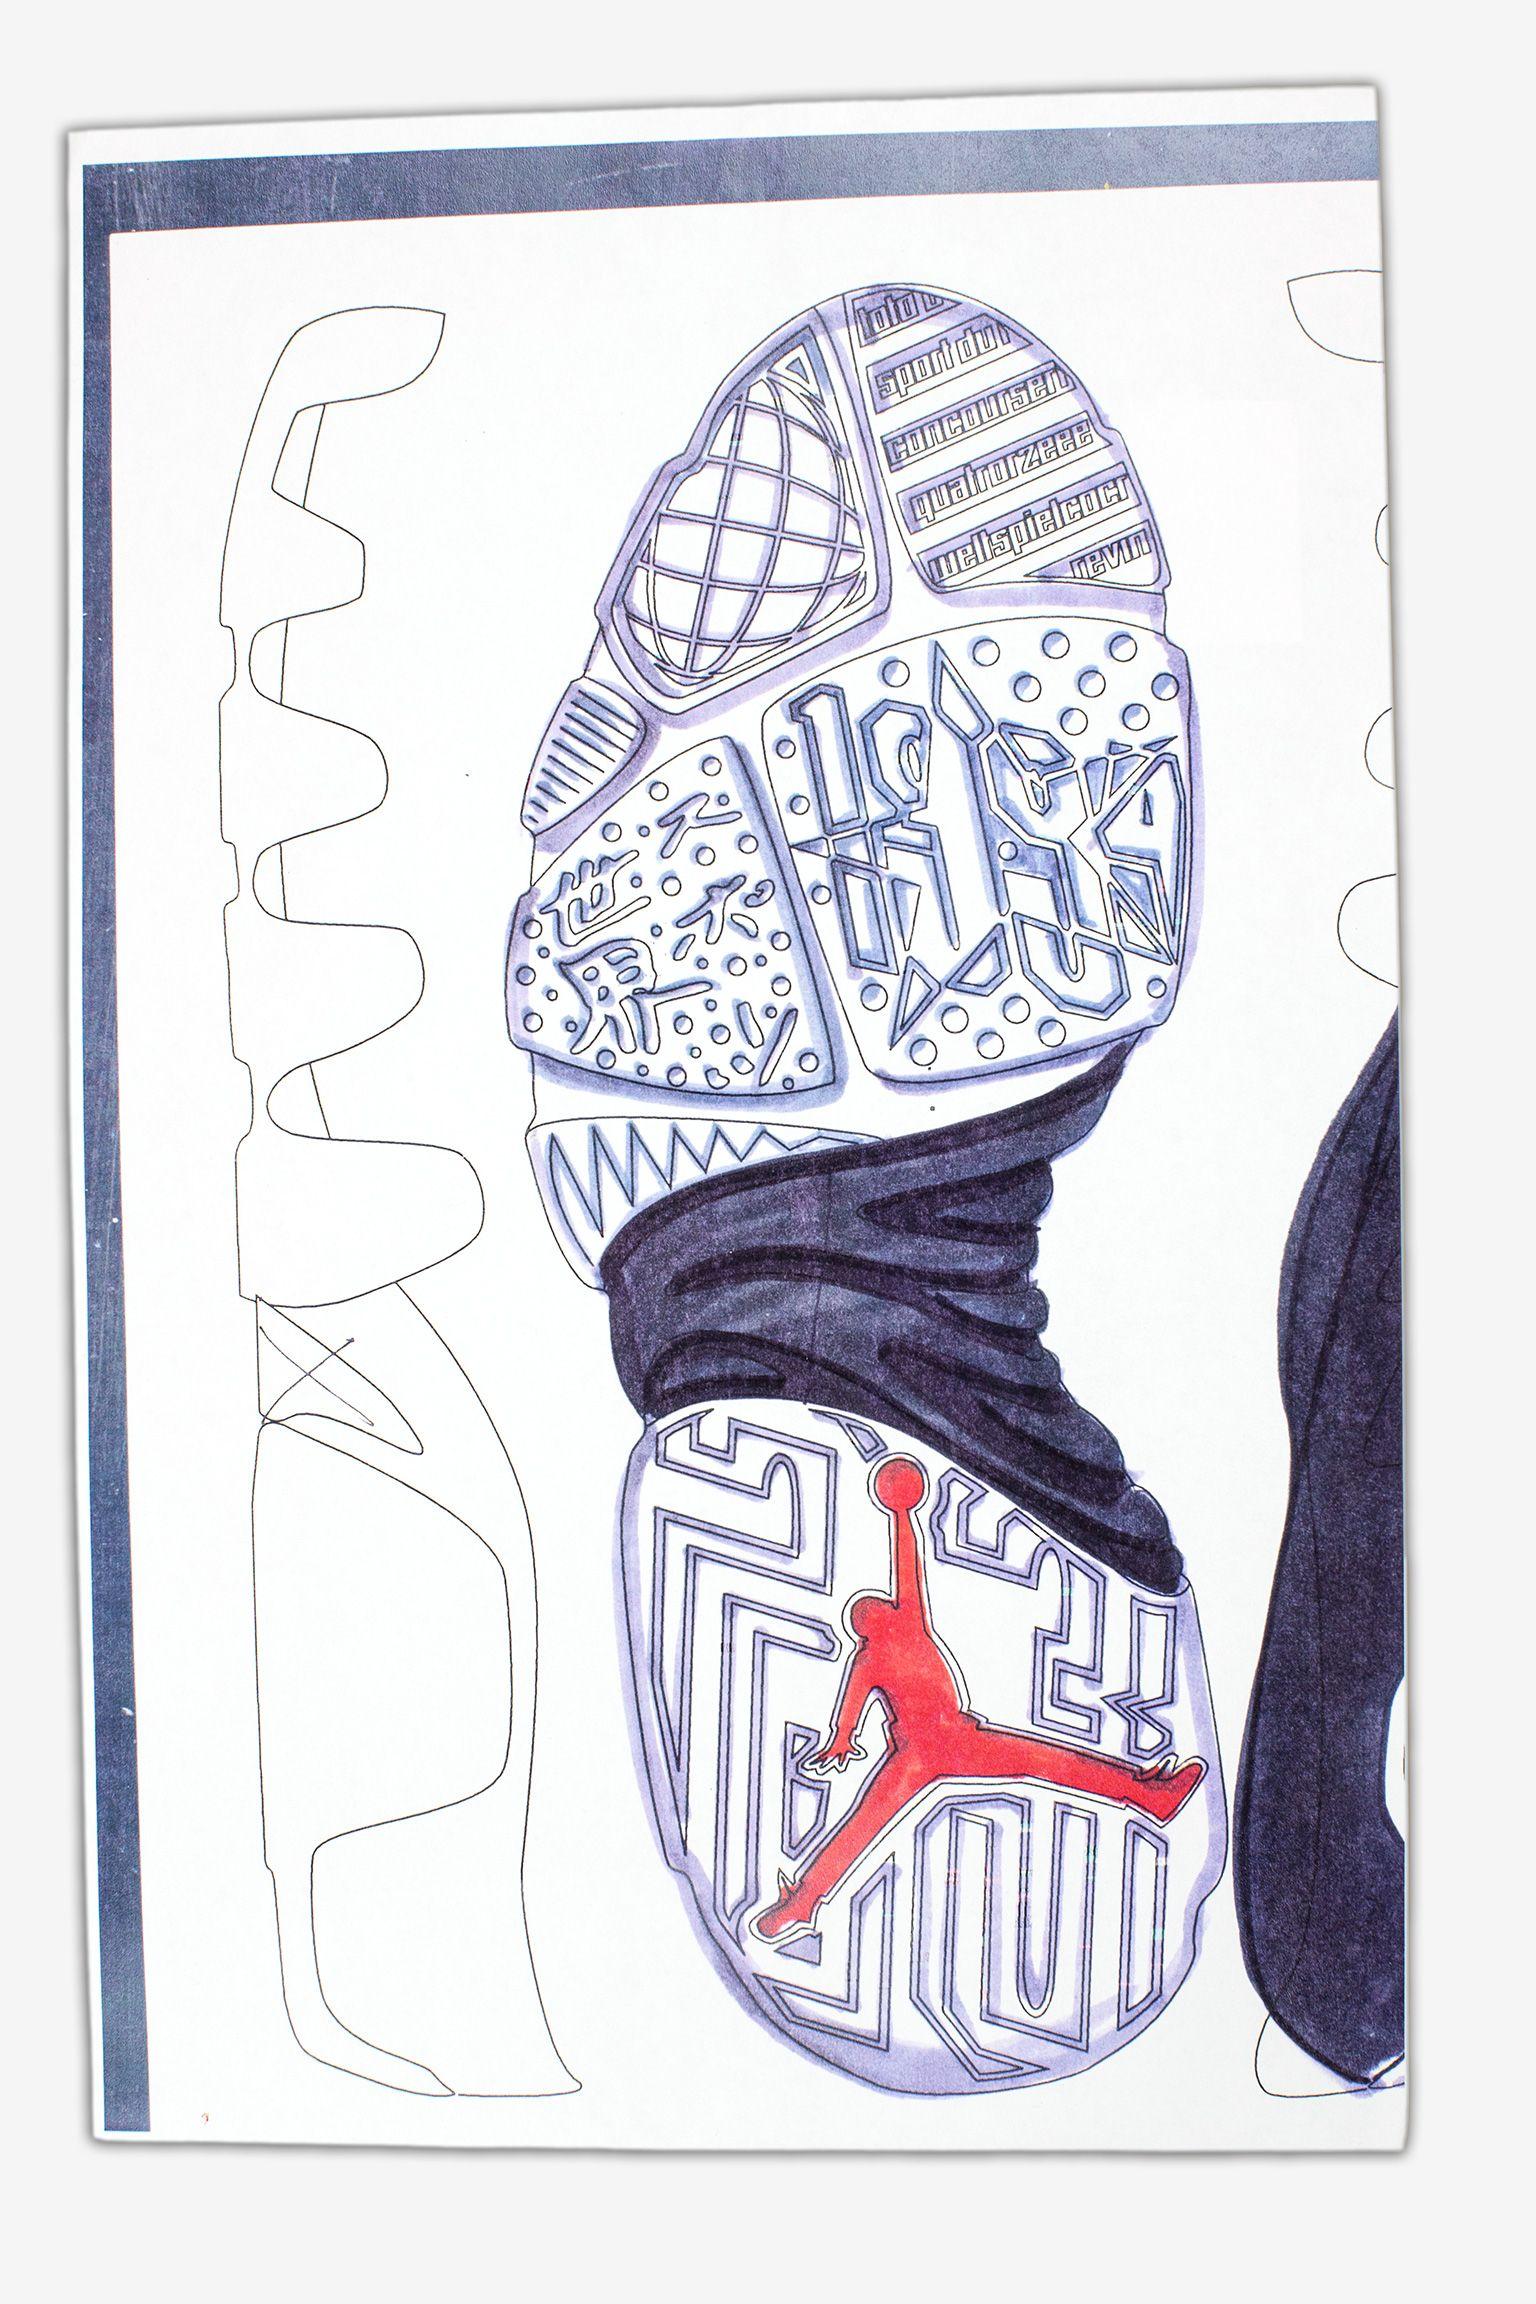 Achter het design: Air Jordan 9 Outsole